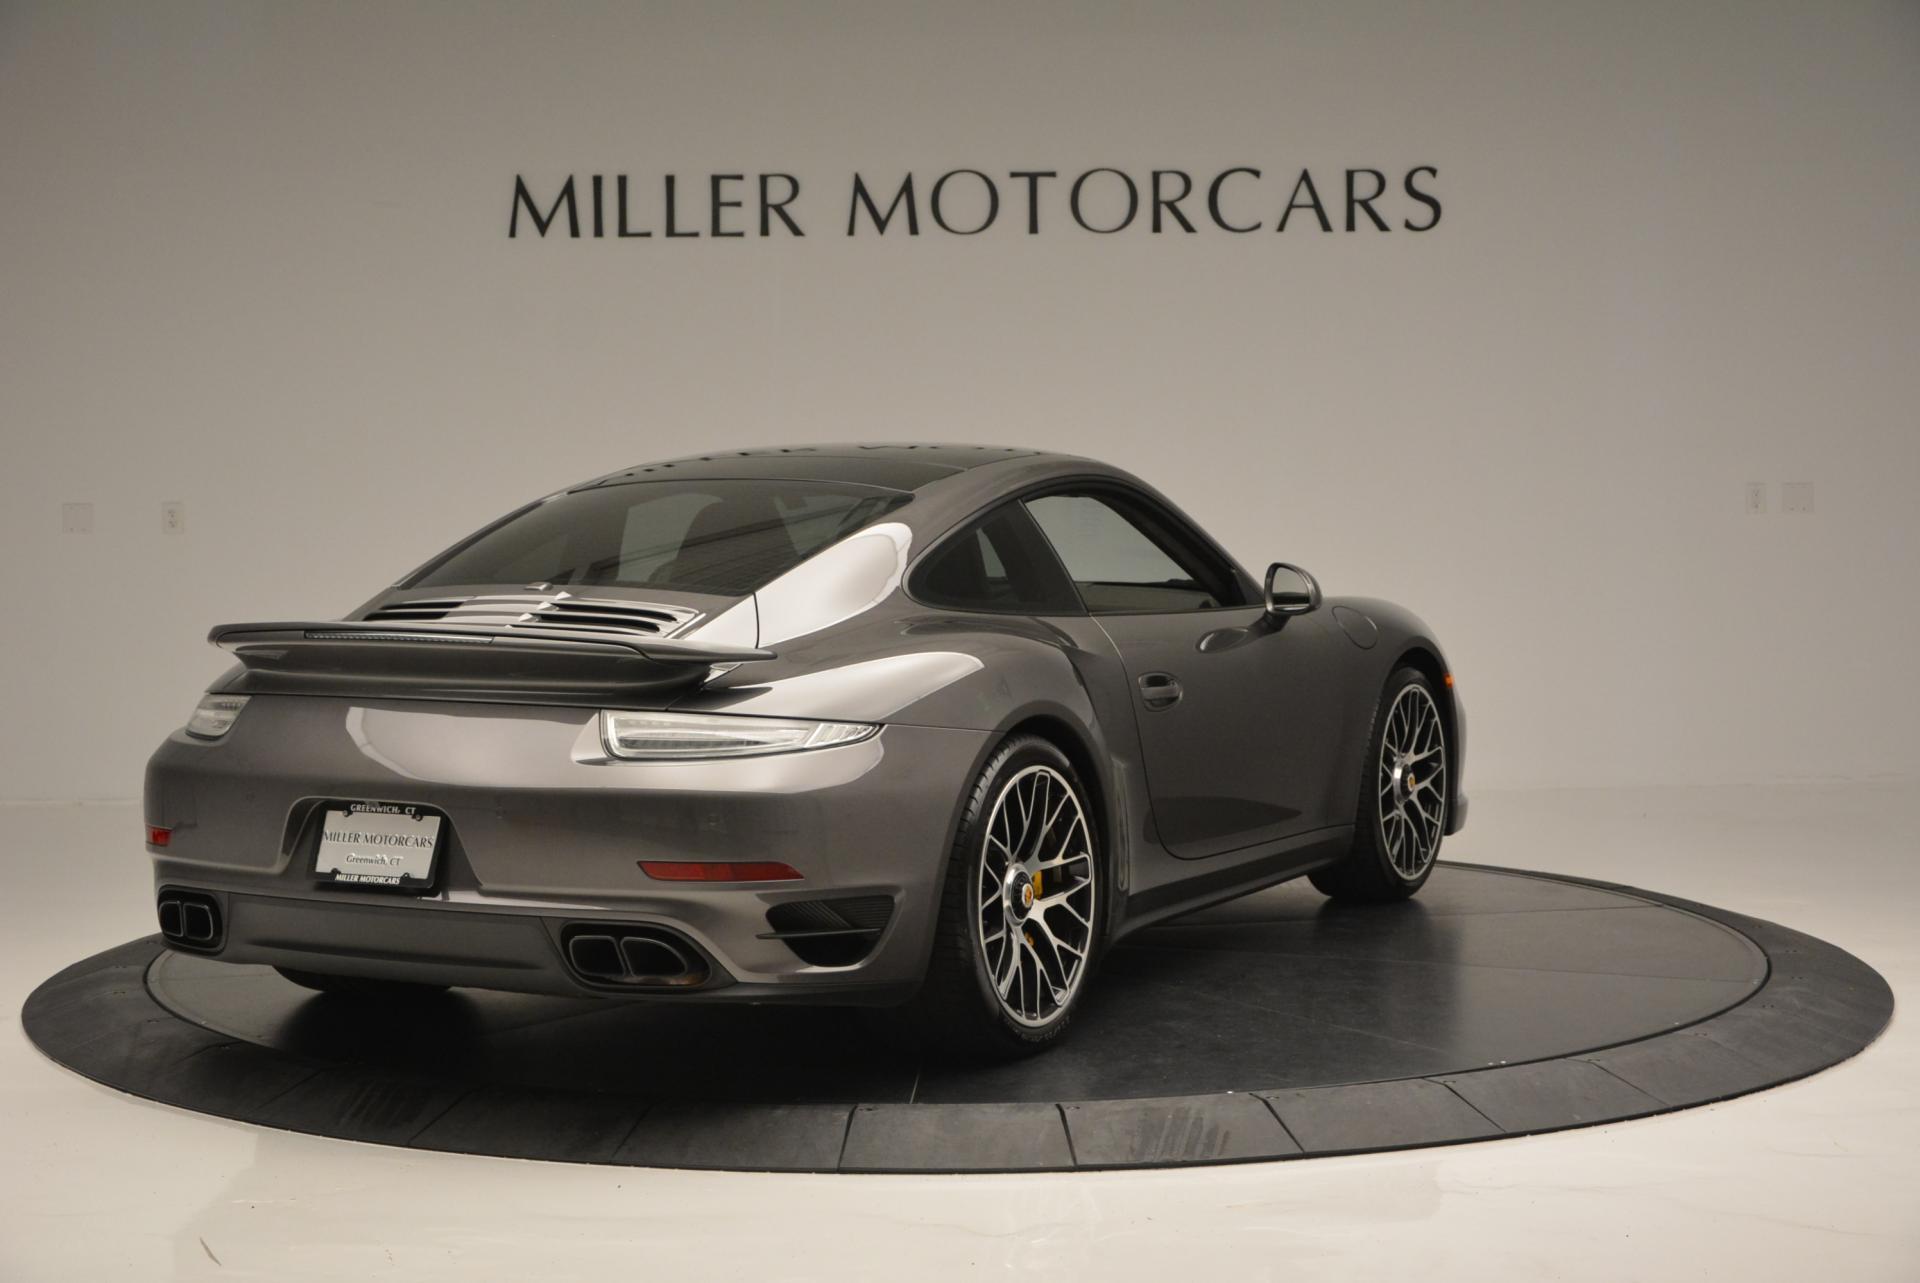 Used 2014 Porsche 911 Turbo S For Sale In Greenwich, CT 113_p6